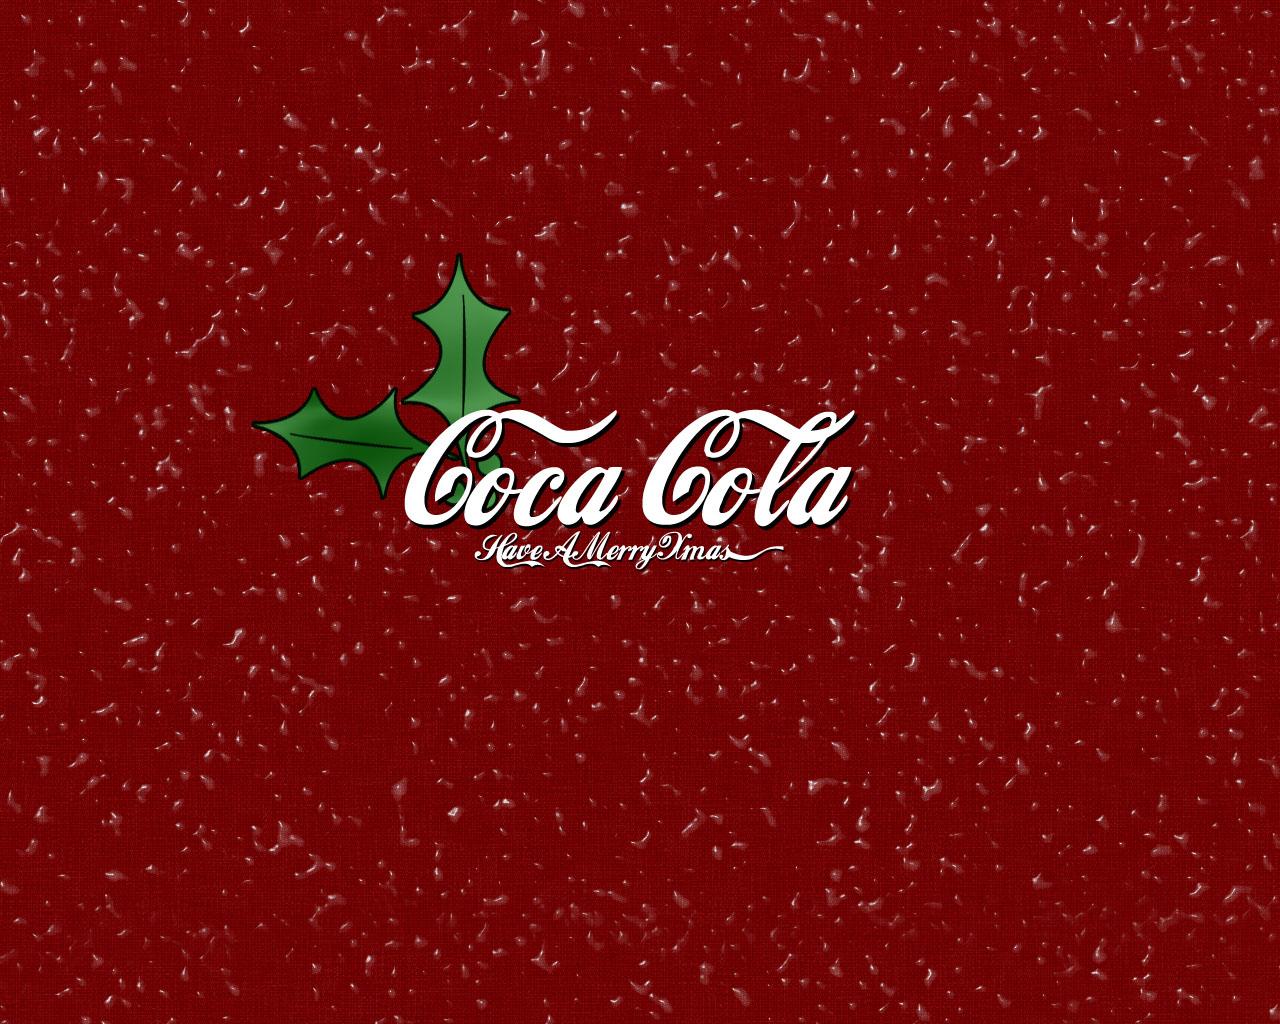 coca cola christmas wallpaper wallpapersafari. Black Bedroom Furniture Sets. Home Design Ideas